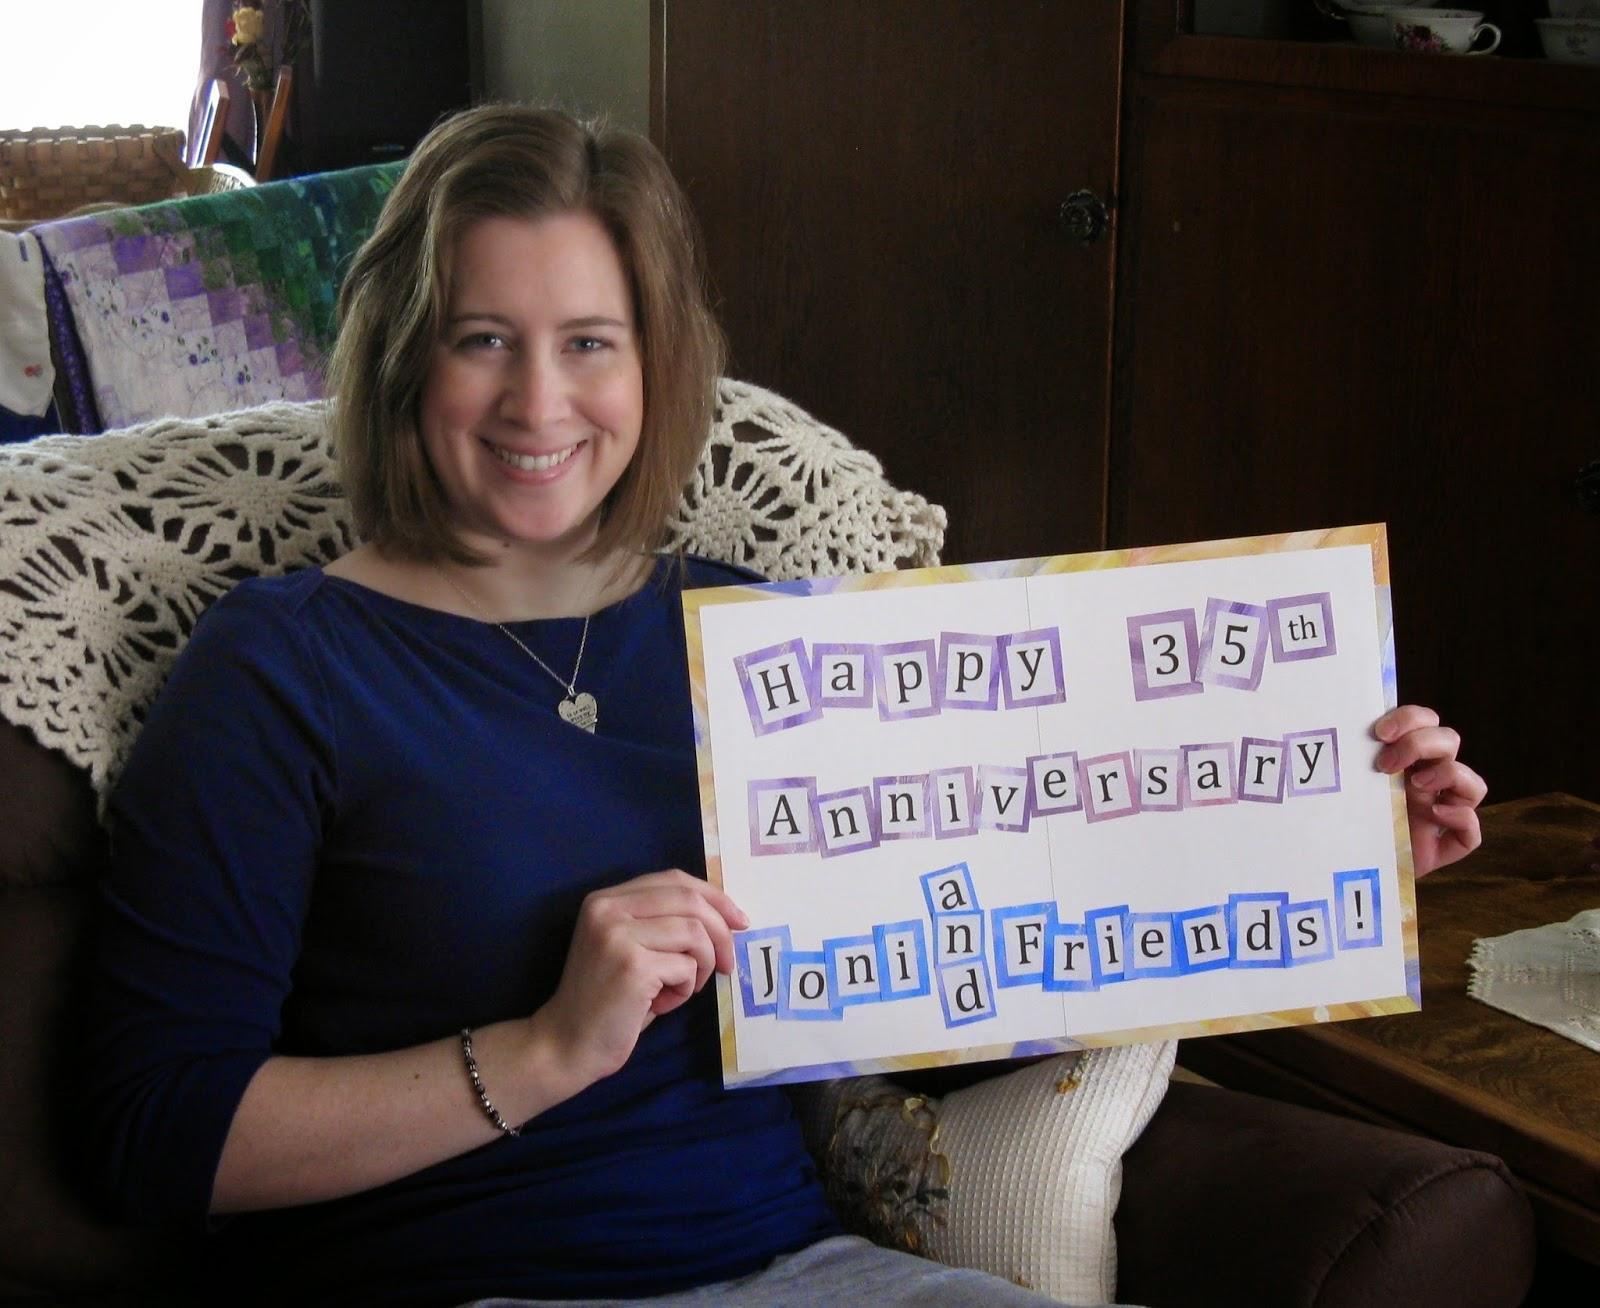 Happy 35th Anniversary, Joni and Friends!